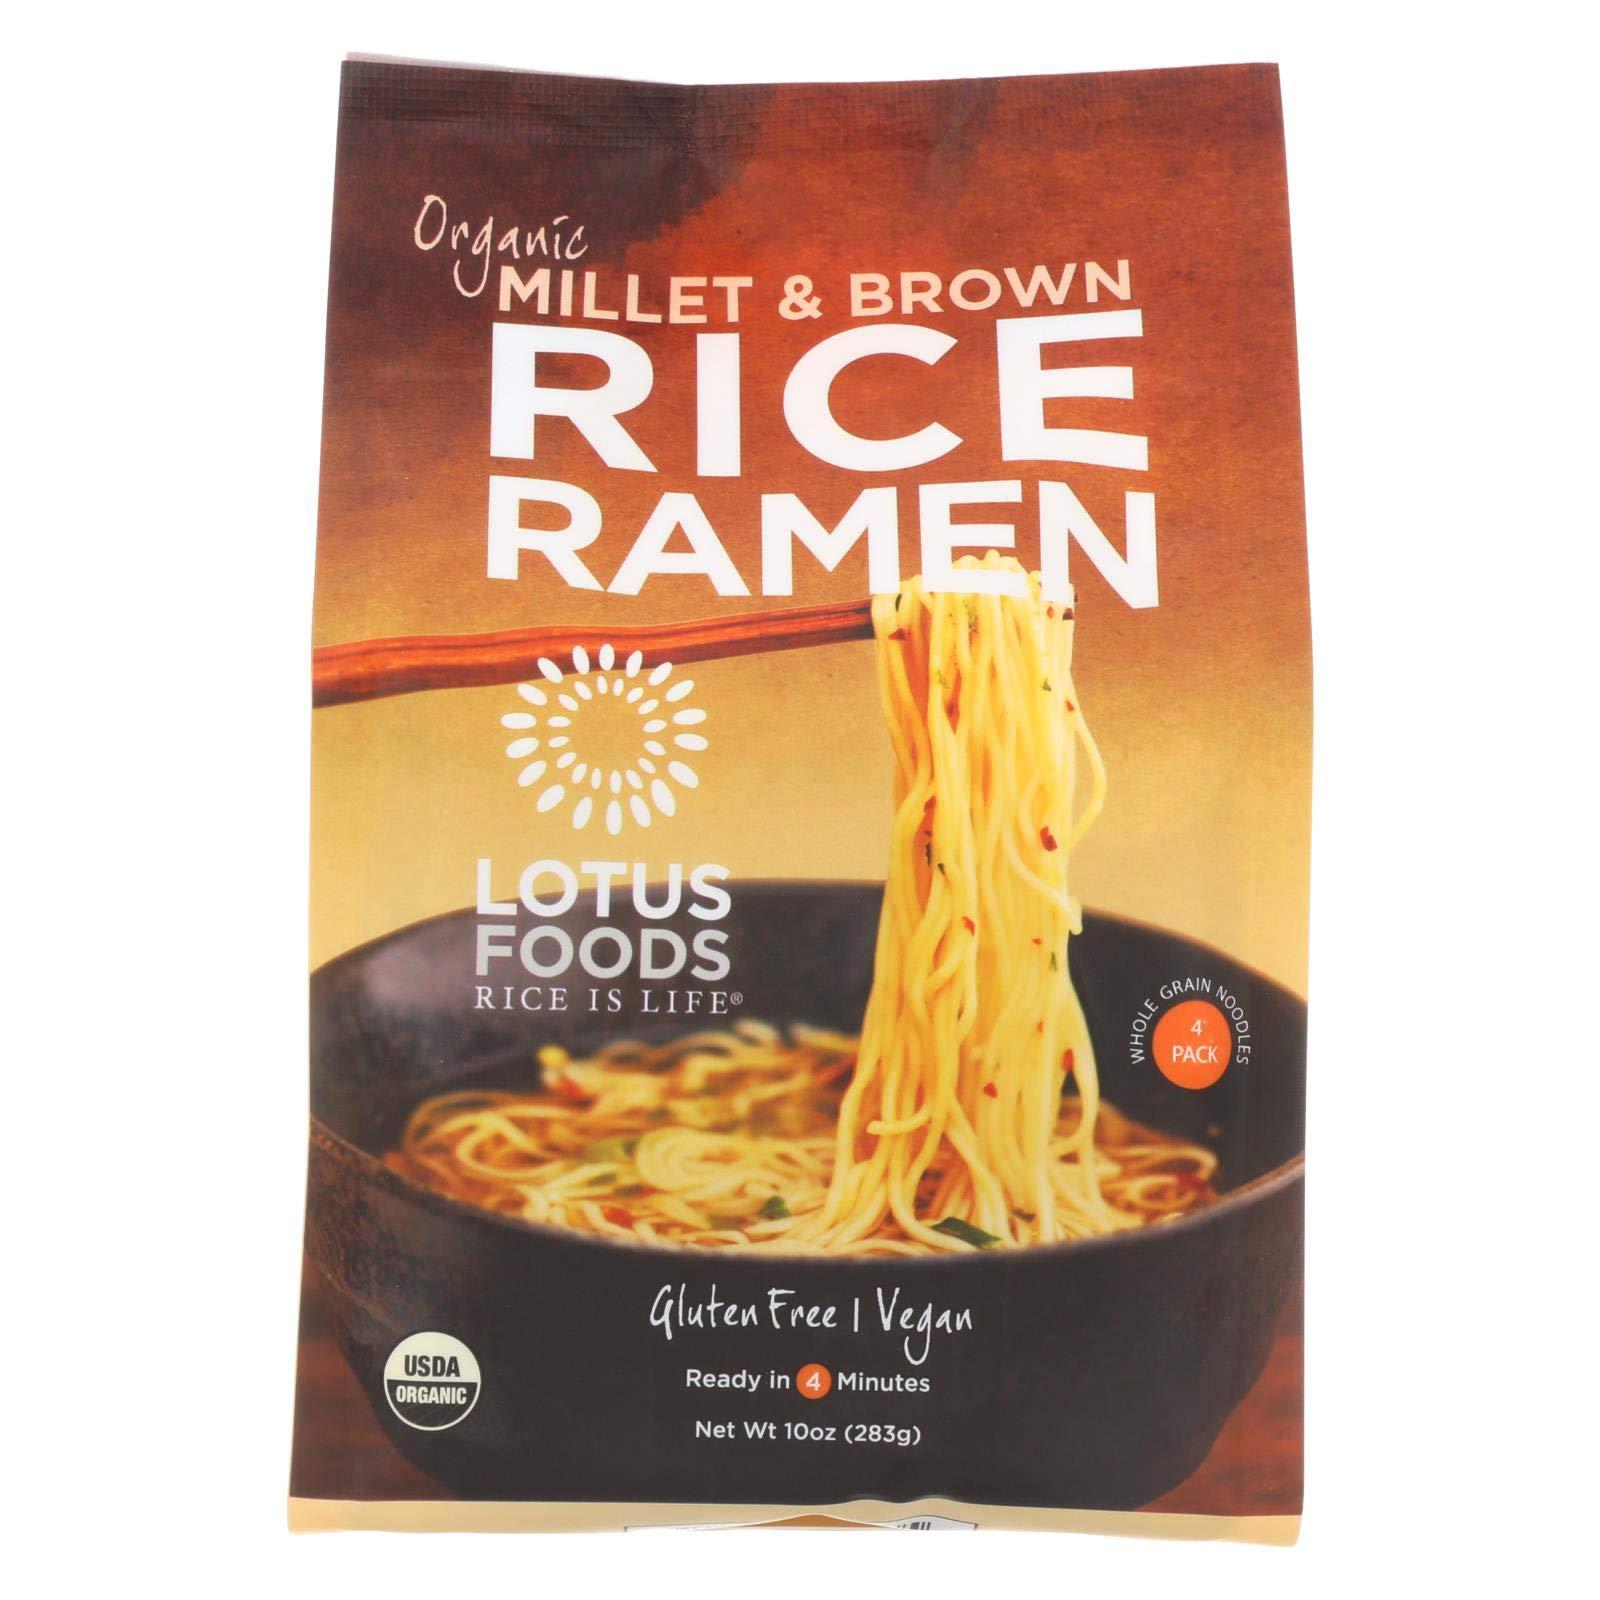 Lotus Foods Organic Millet and Brown Rice Ramen, 10 Ounce - 4 per pack - 6 packs per case. by Lotus Foods